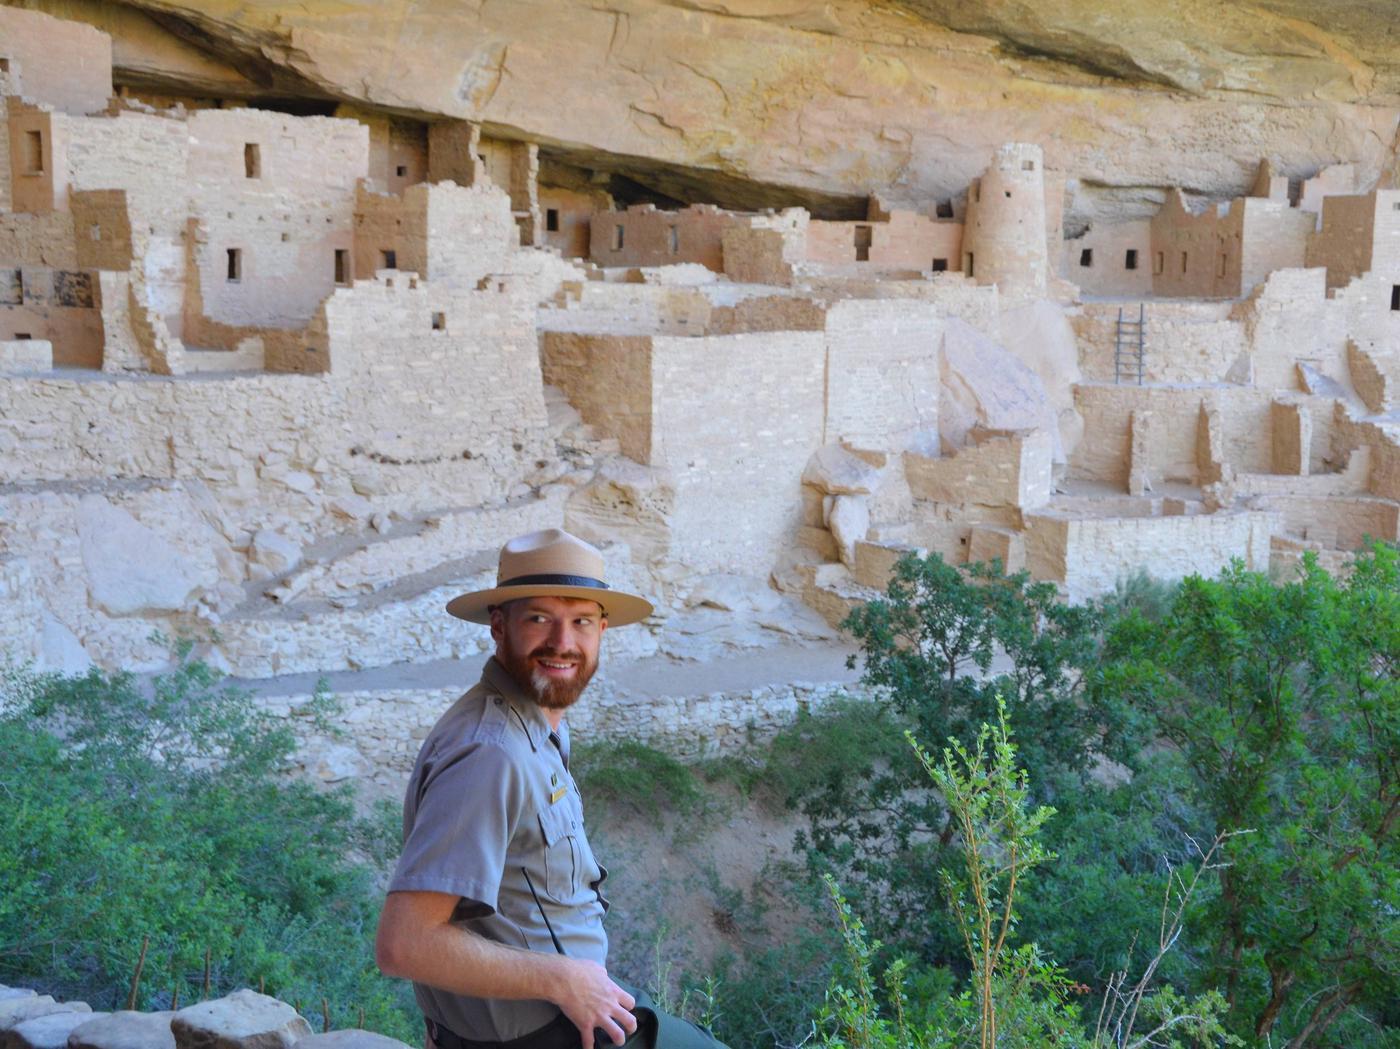 NPS Ranger Describing the Historic Cliff Dwellings at Mesa Verde